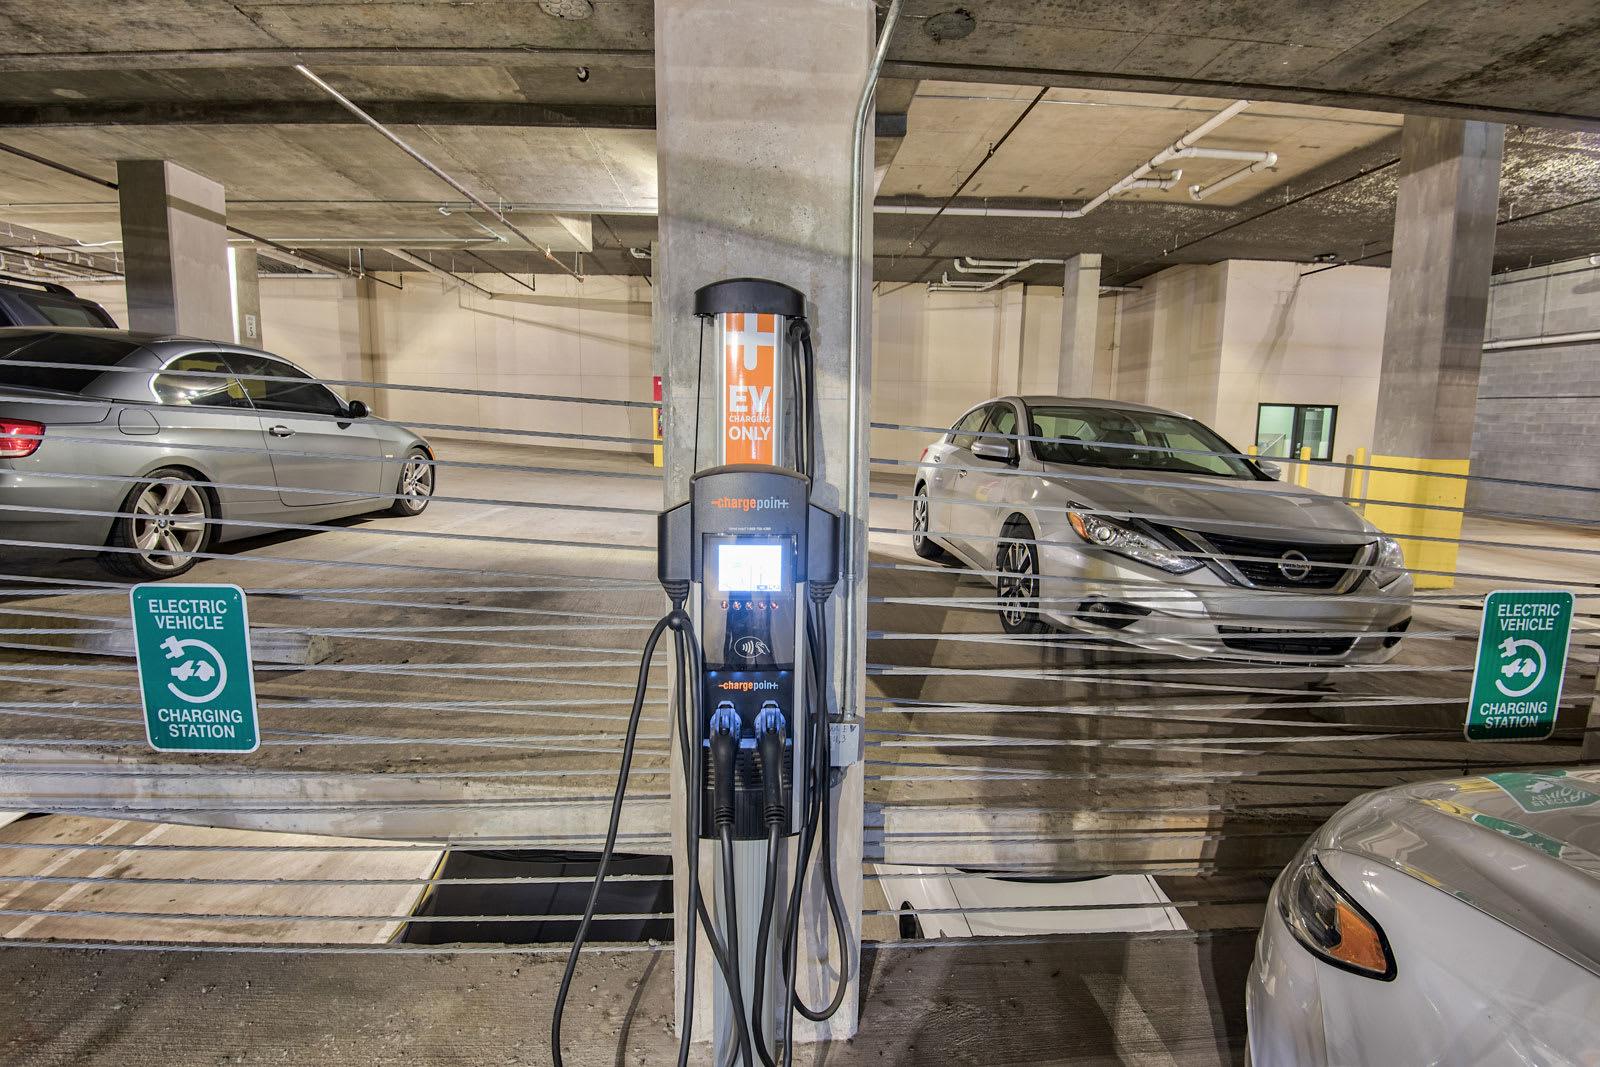 E/V charging station at Midtown Houston by Windsor, Houston, TX